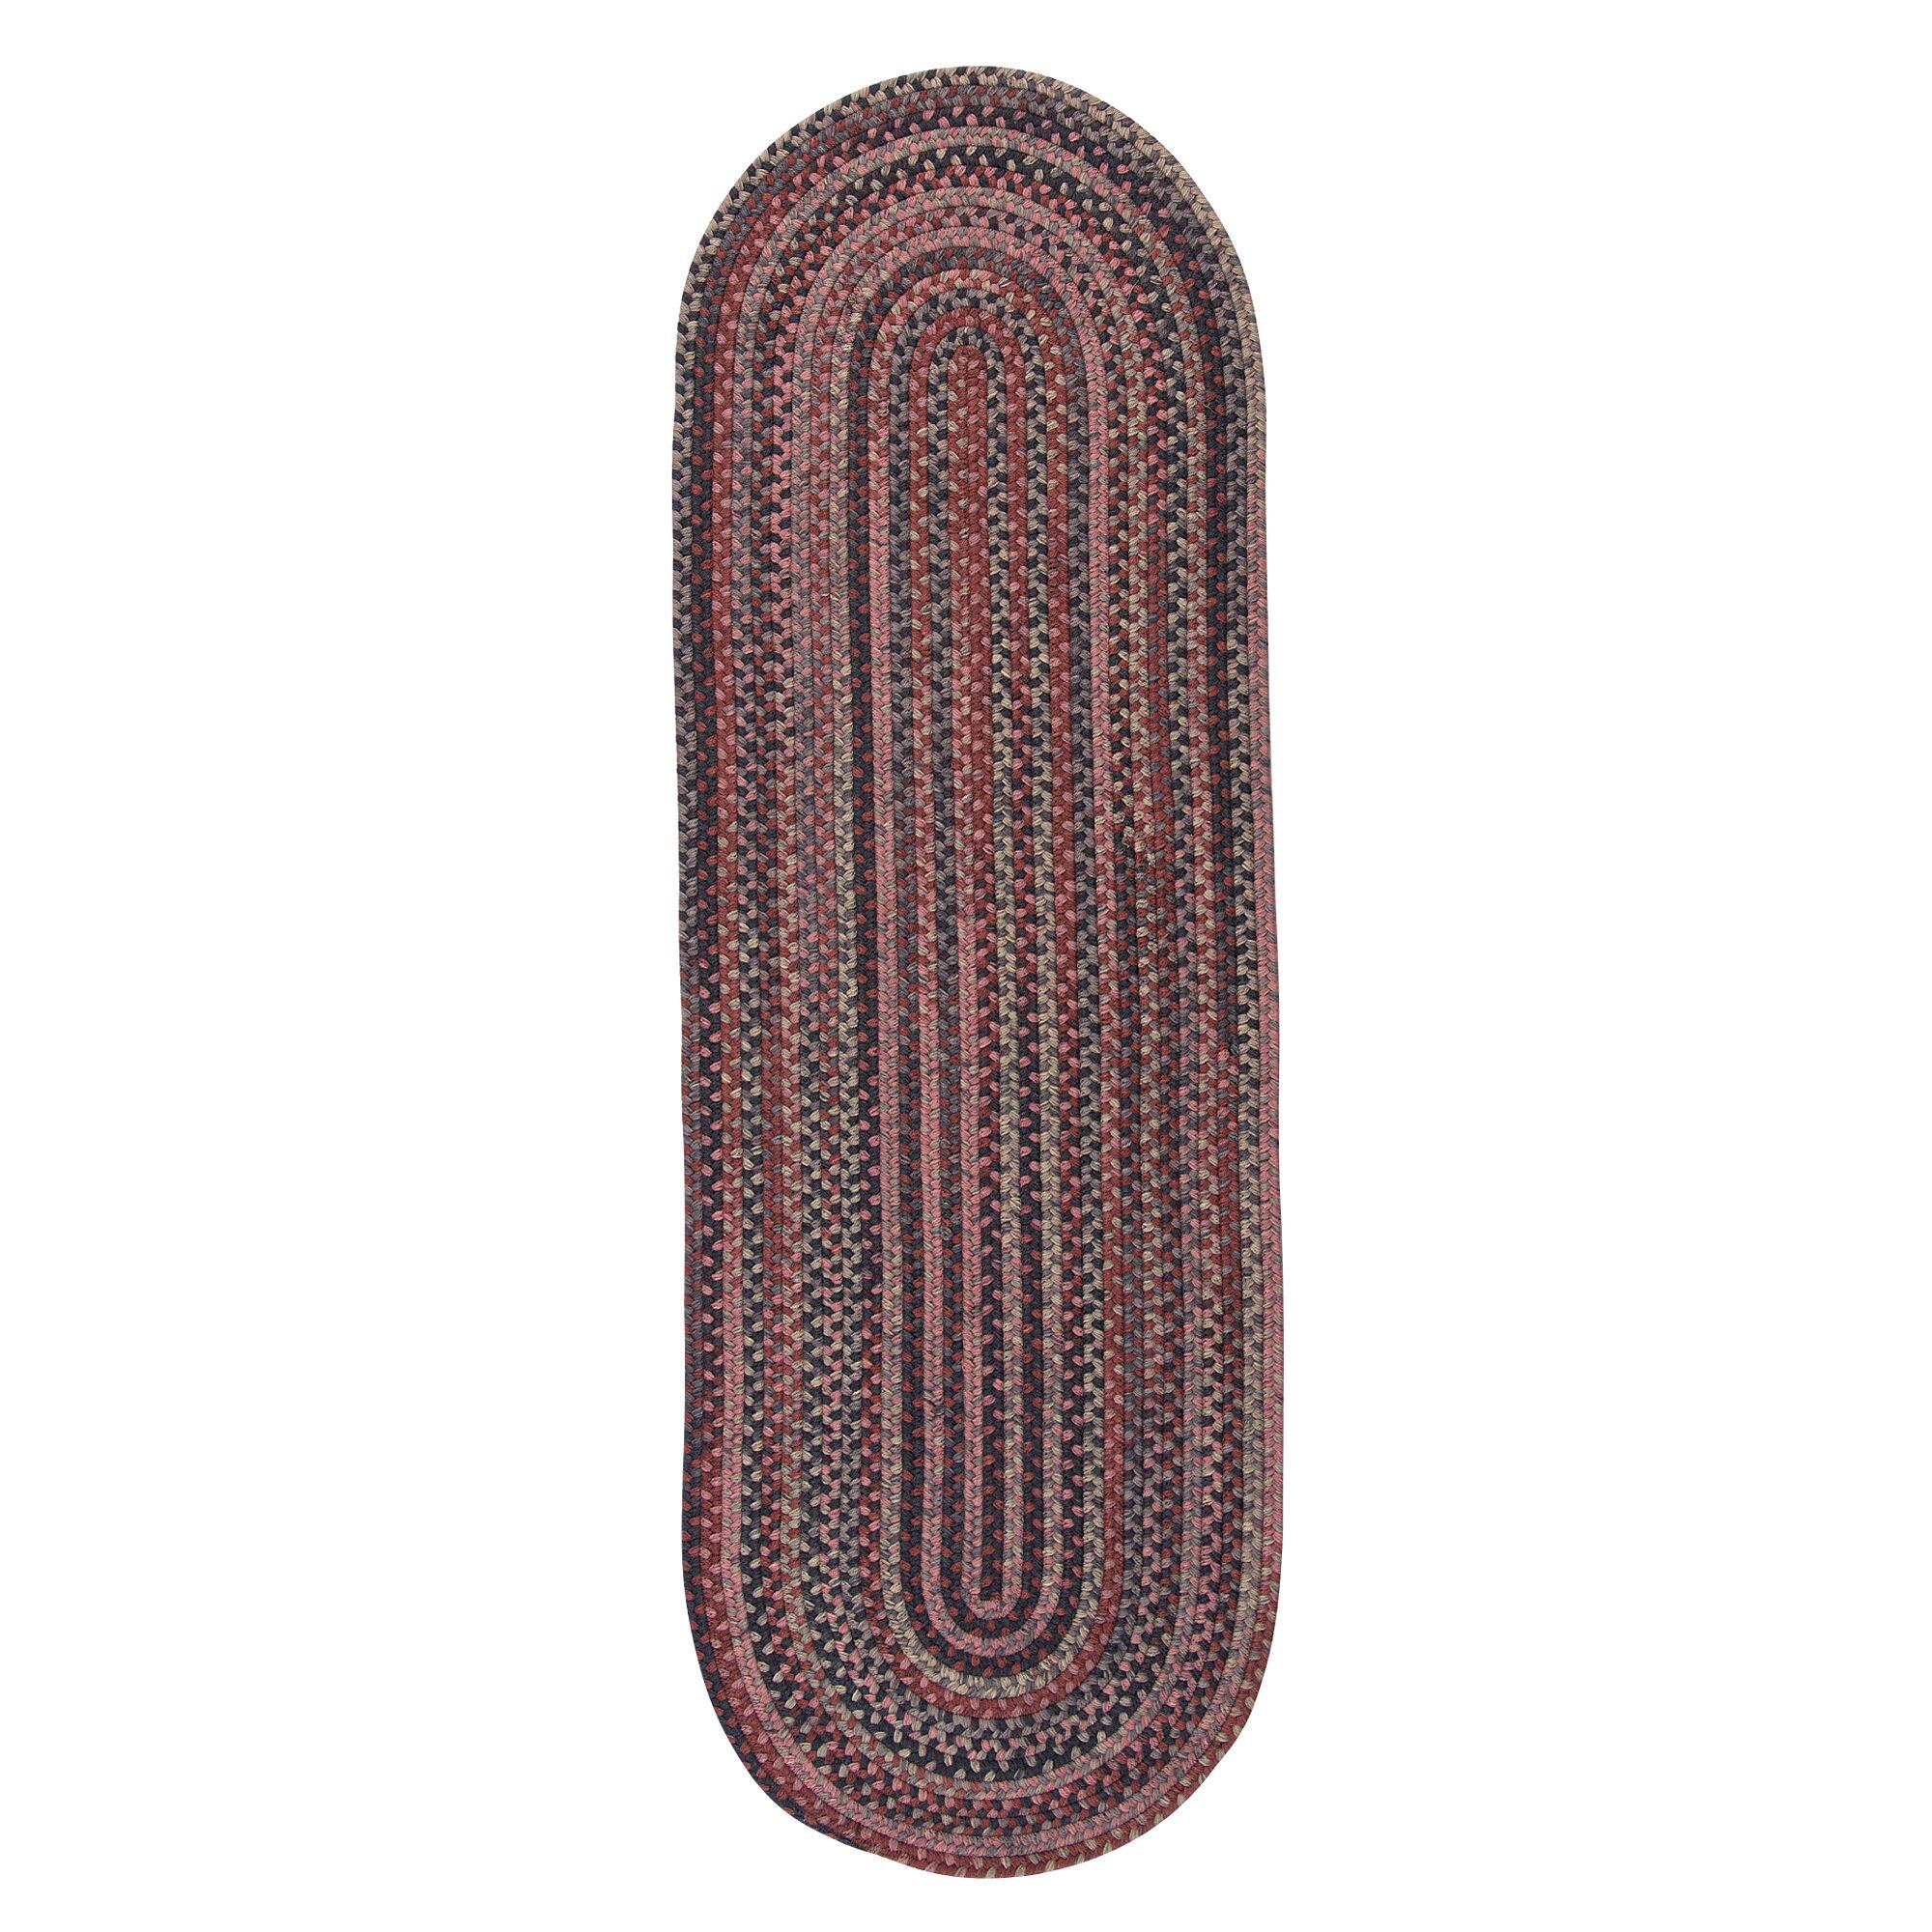 Nala Runner Hand-Braided Wool Red Area Rug Rug Size: Runner 2'6